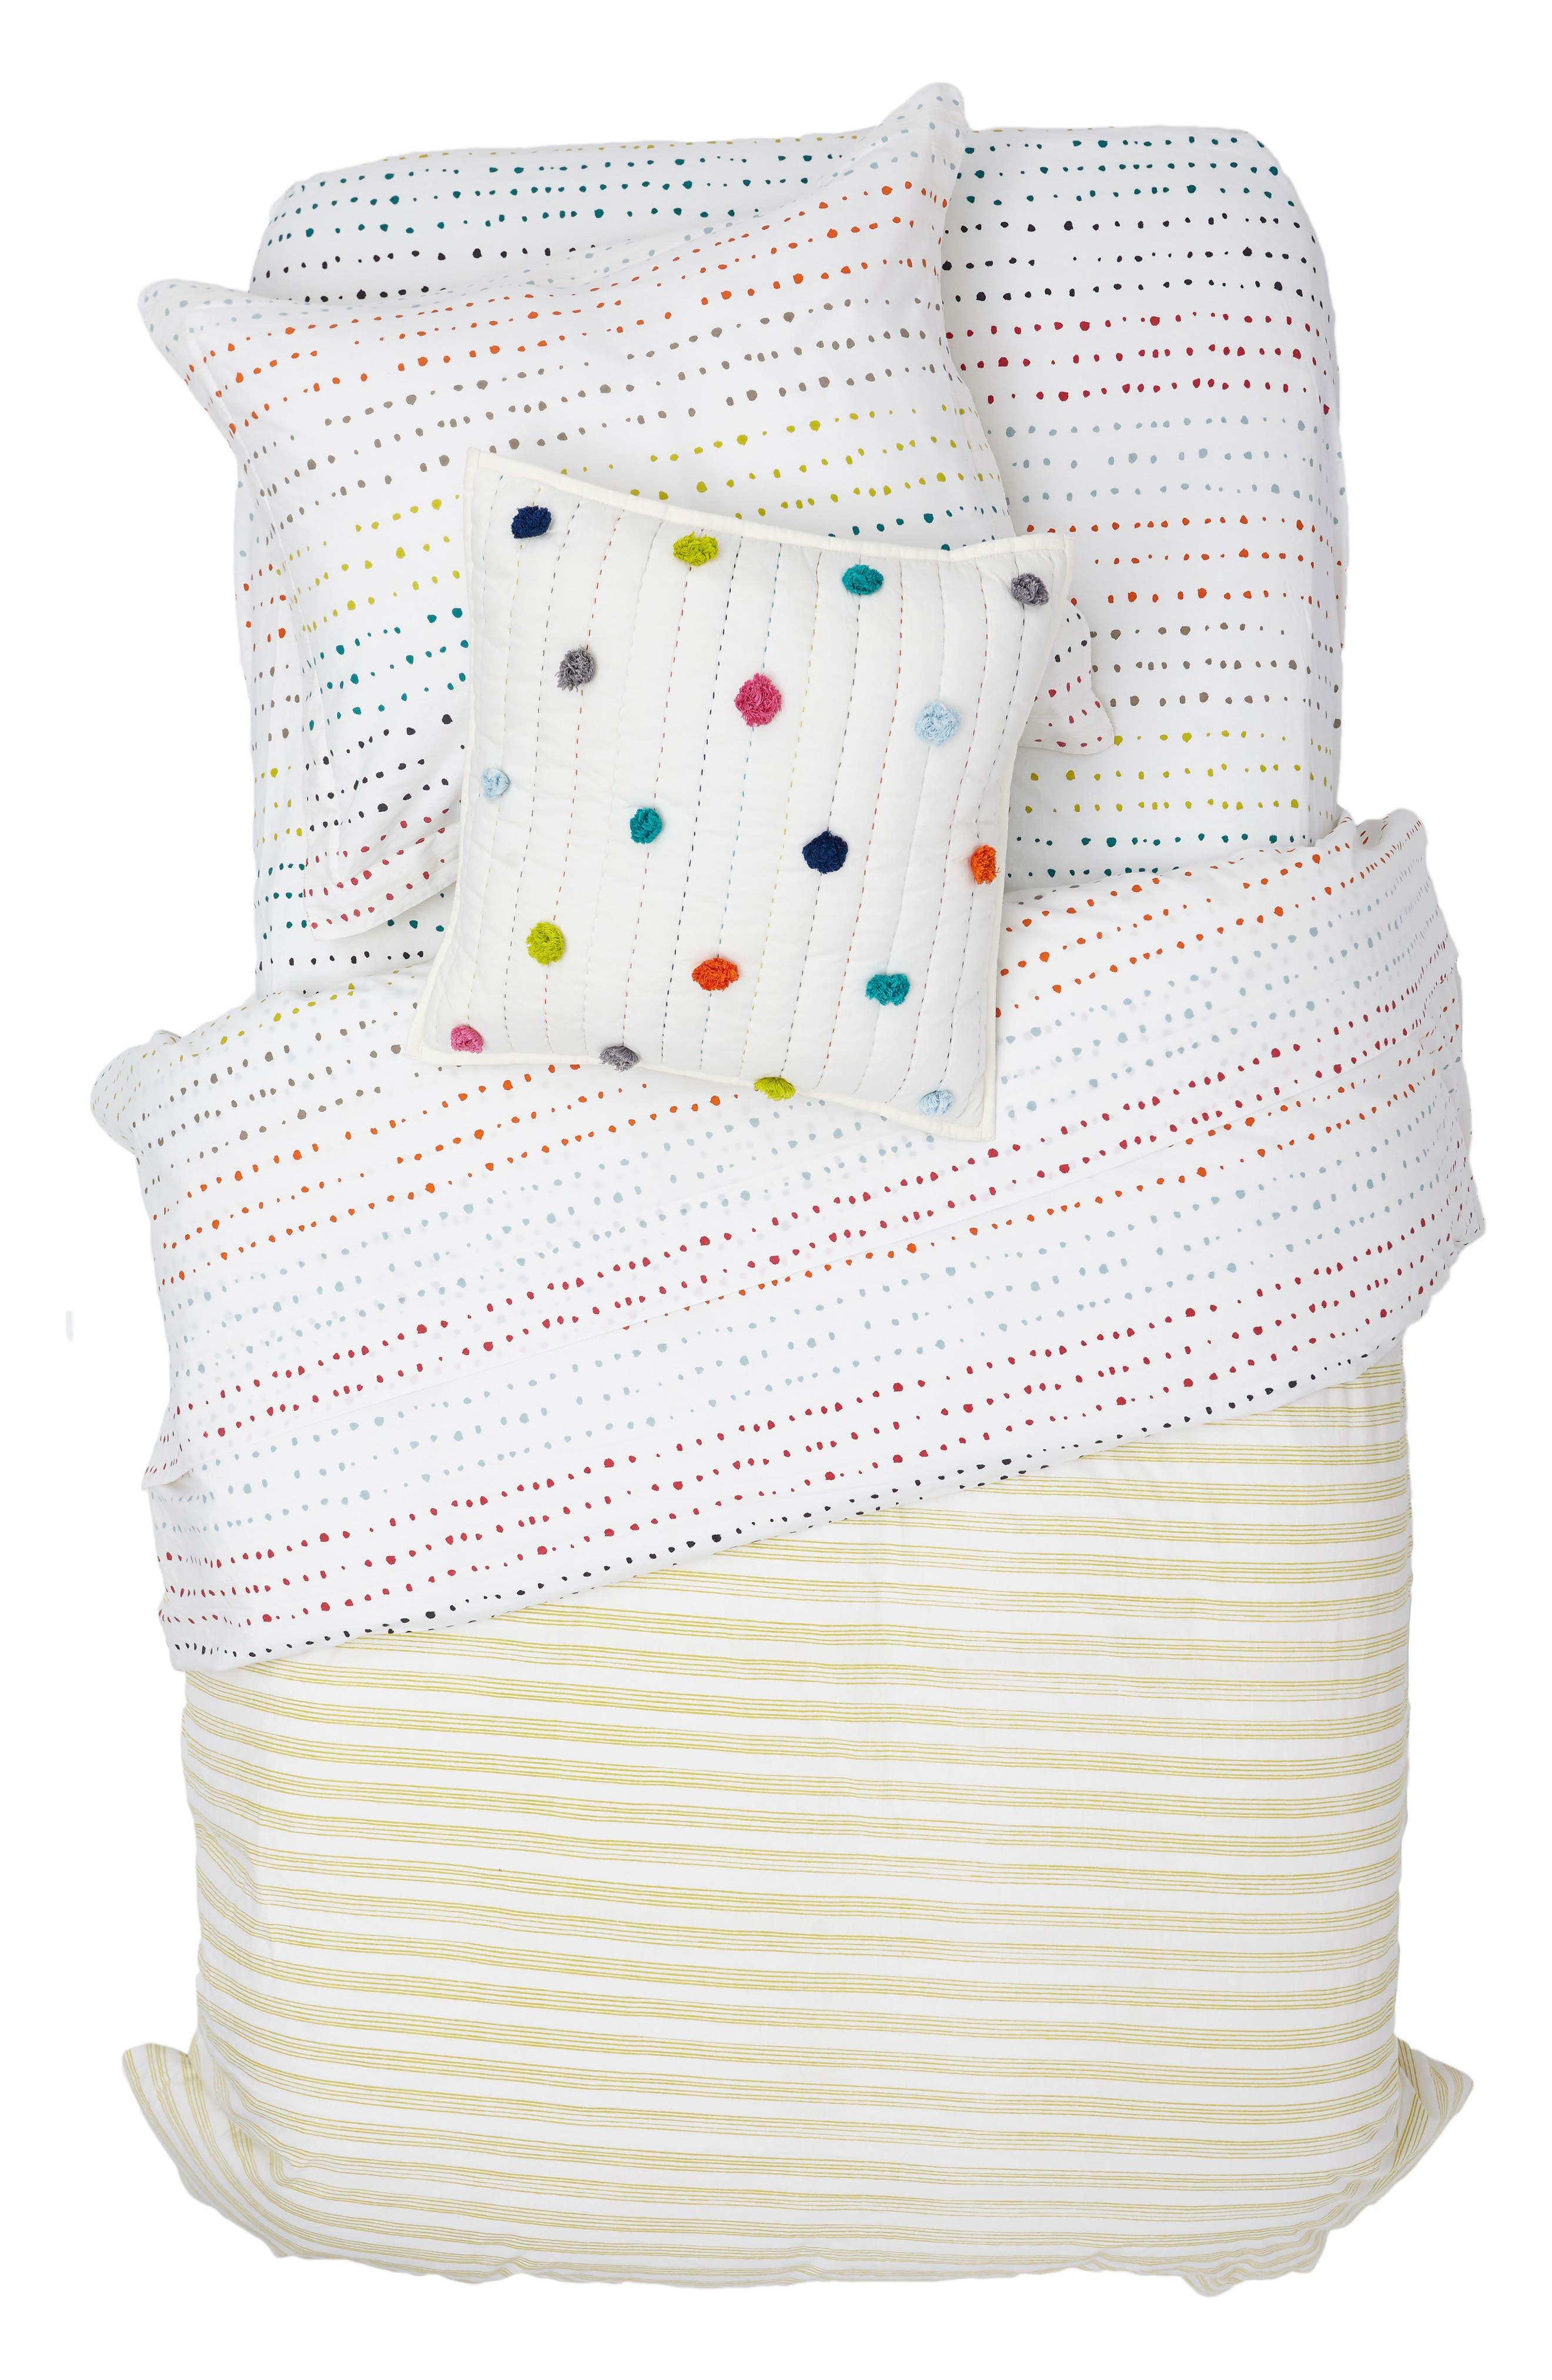 Painted Dots Reversible Duvet Cover,                             Alternate thumbnail 2, color,                             100